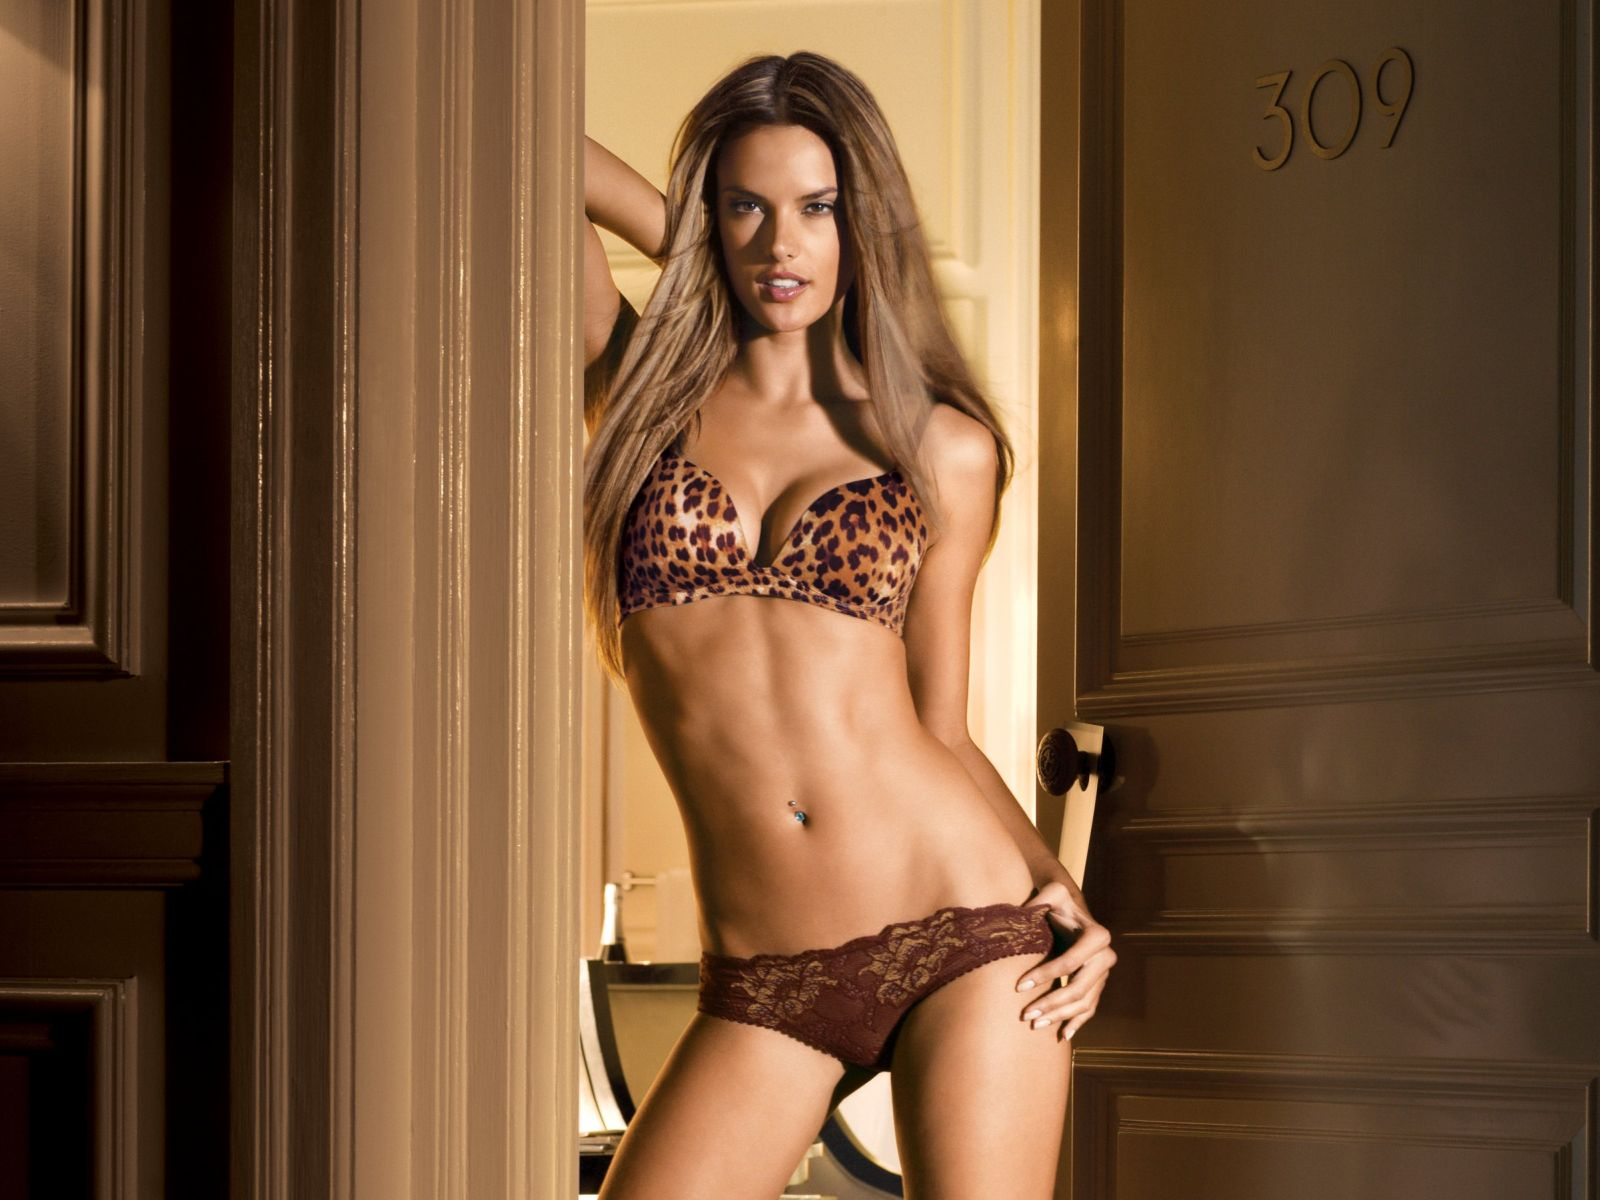 http://1.bp.blogspot.com/_d8SGbsS-WzU/TMswDO7G6VI/AAAAAAAAAnU/L9wpnTfvSUc/s1600/hot_girl_alessandra_ambrosio-normal.jpg